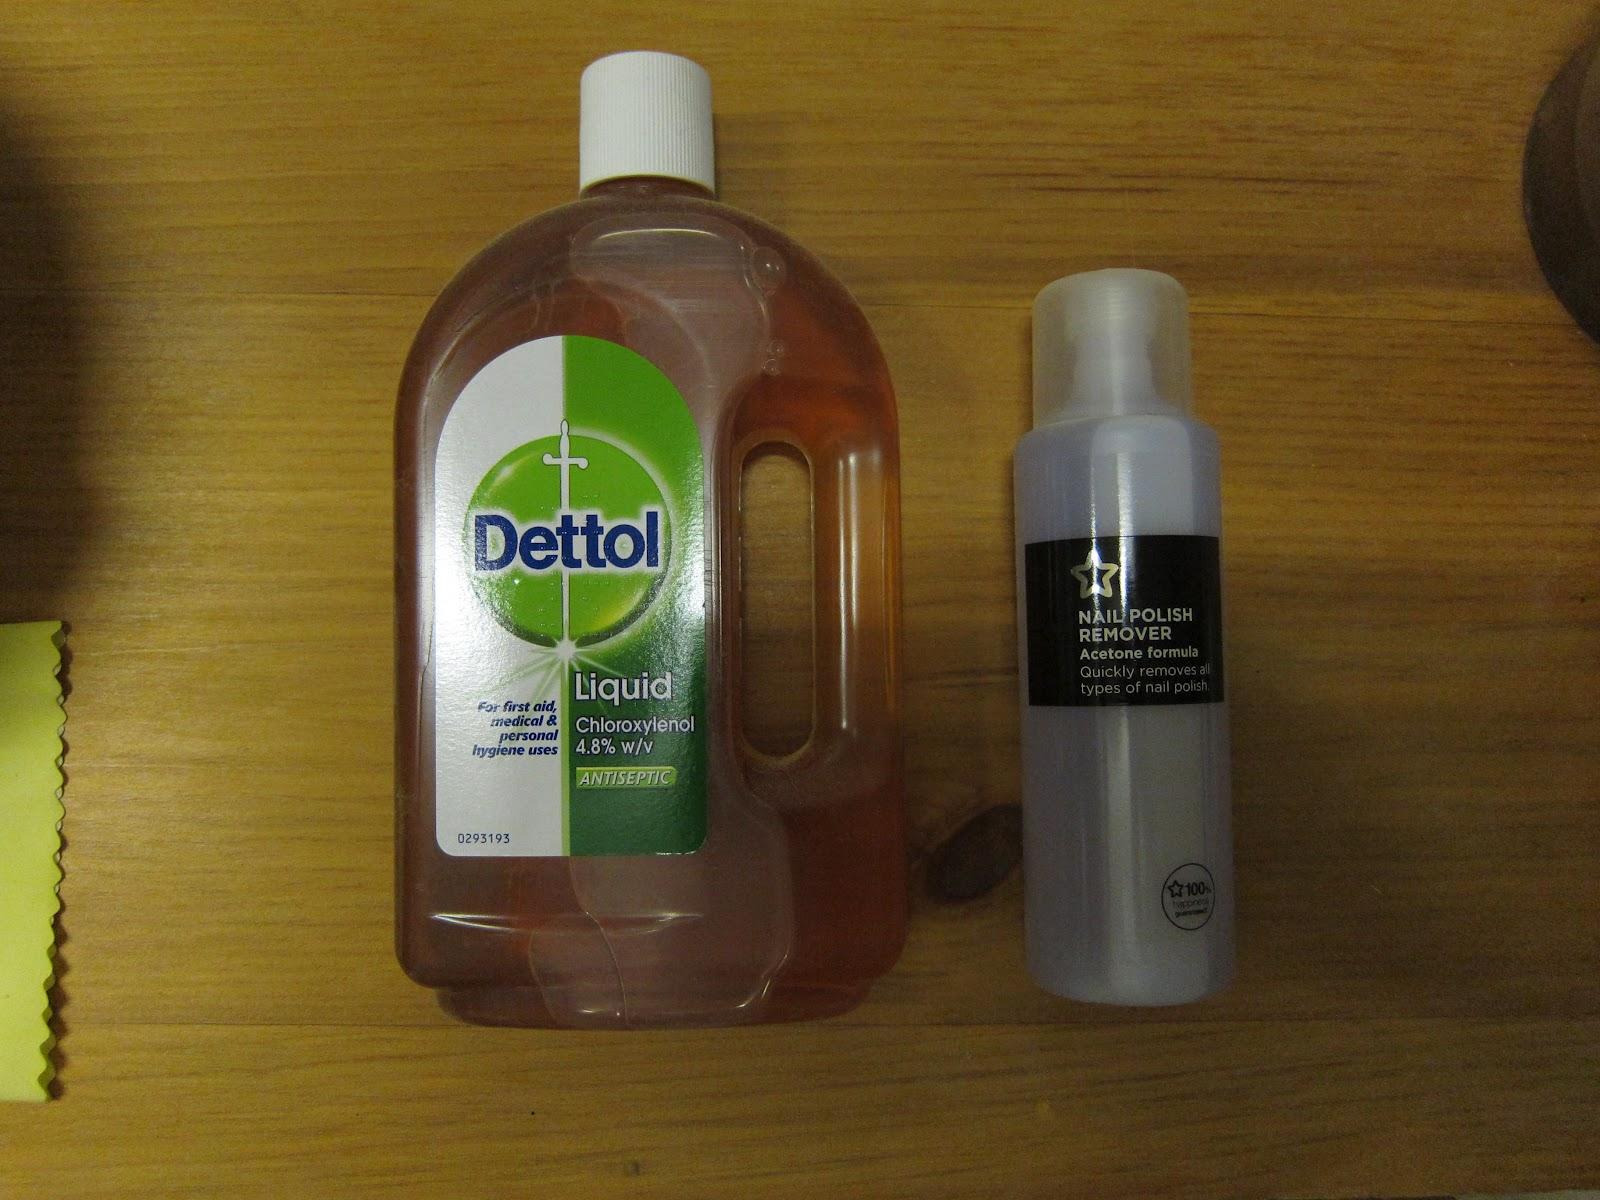 Nail Polish Remover Dissolve Super Glue Hession Hairdressing